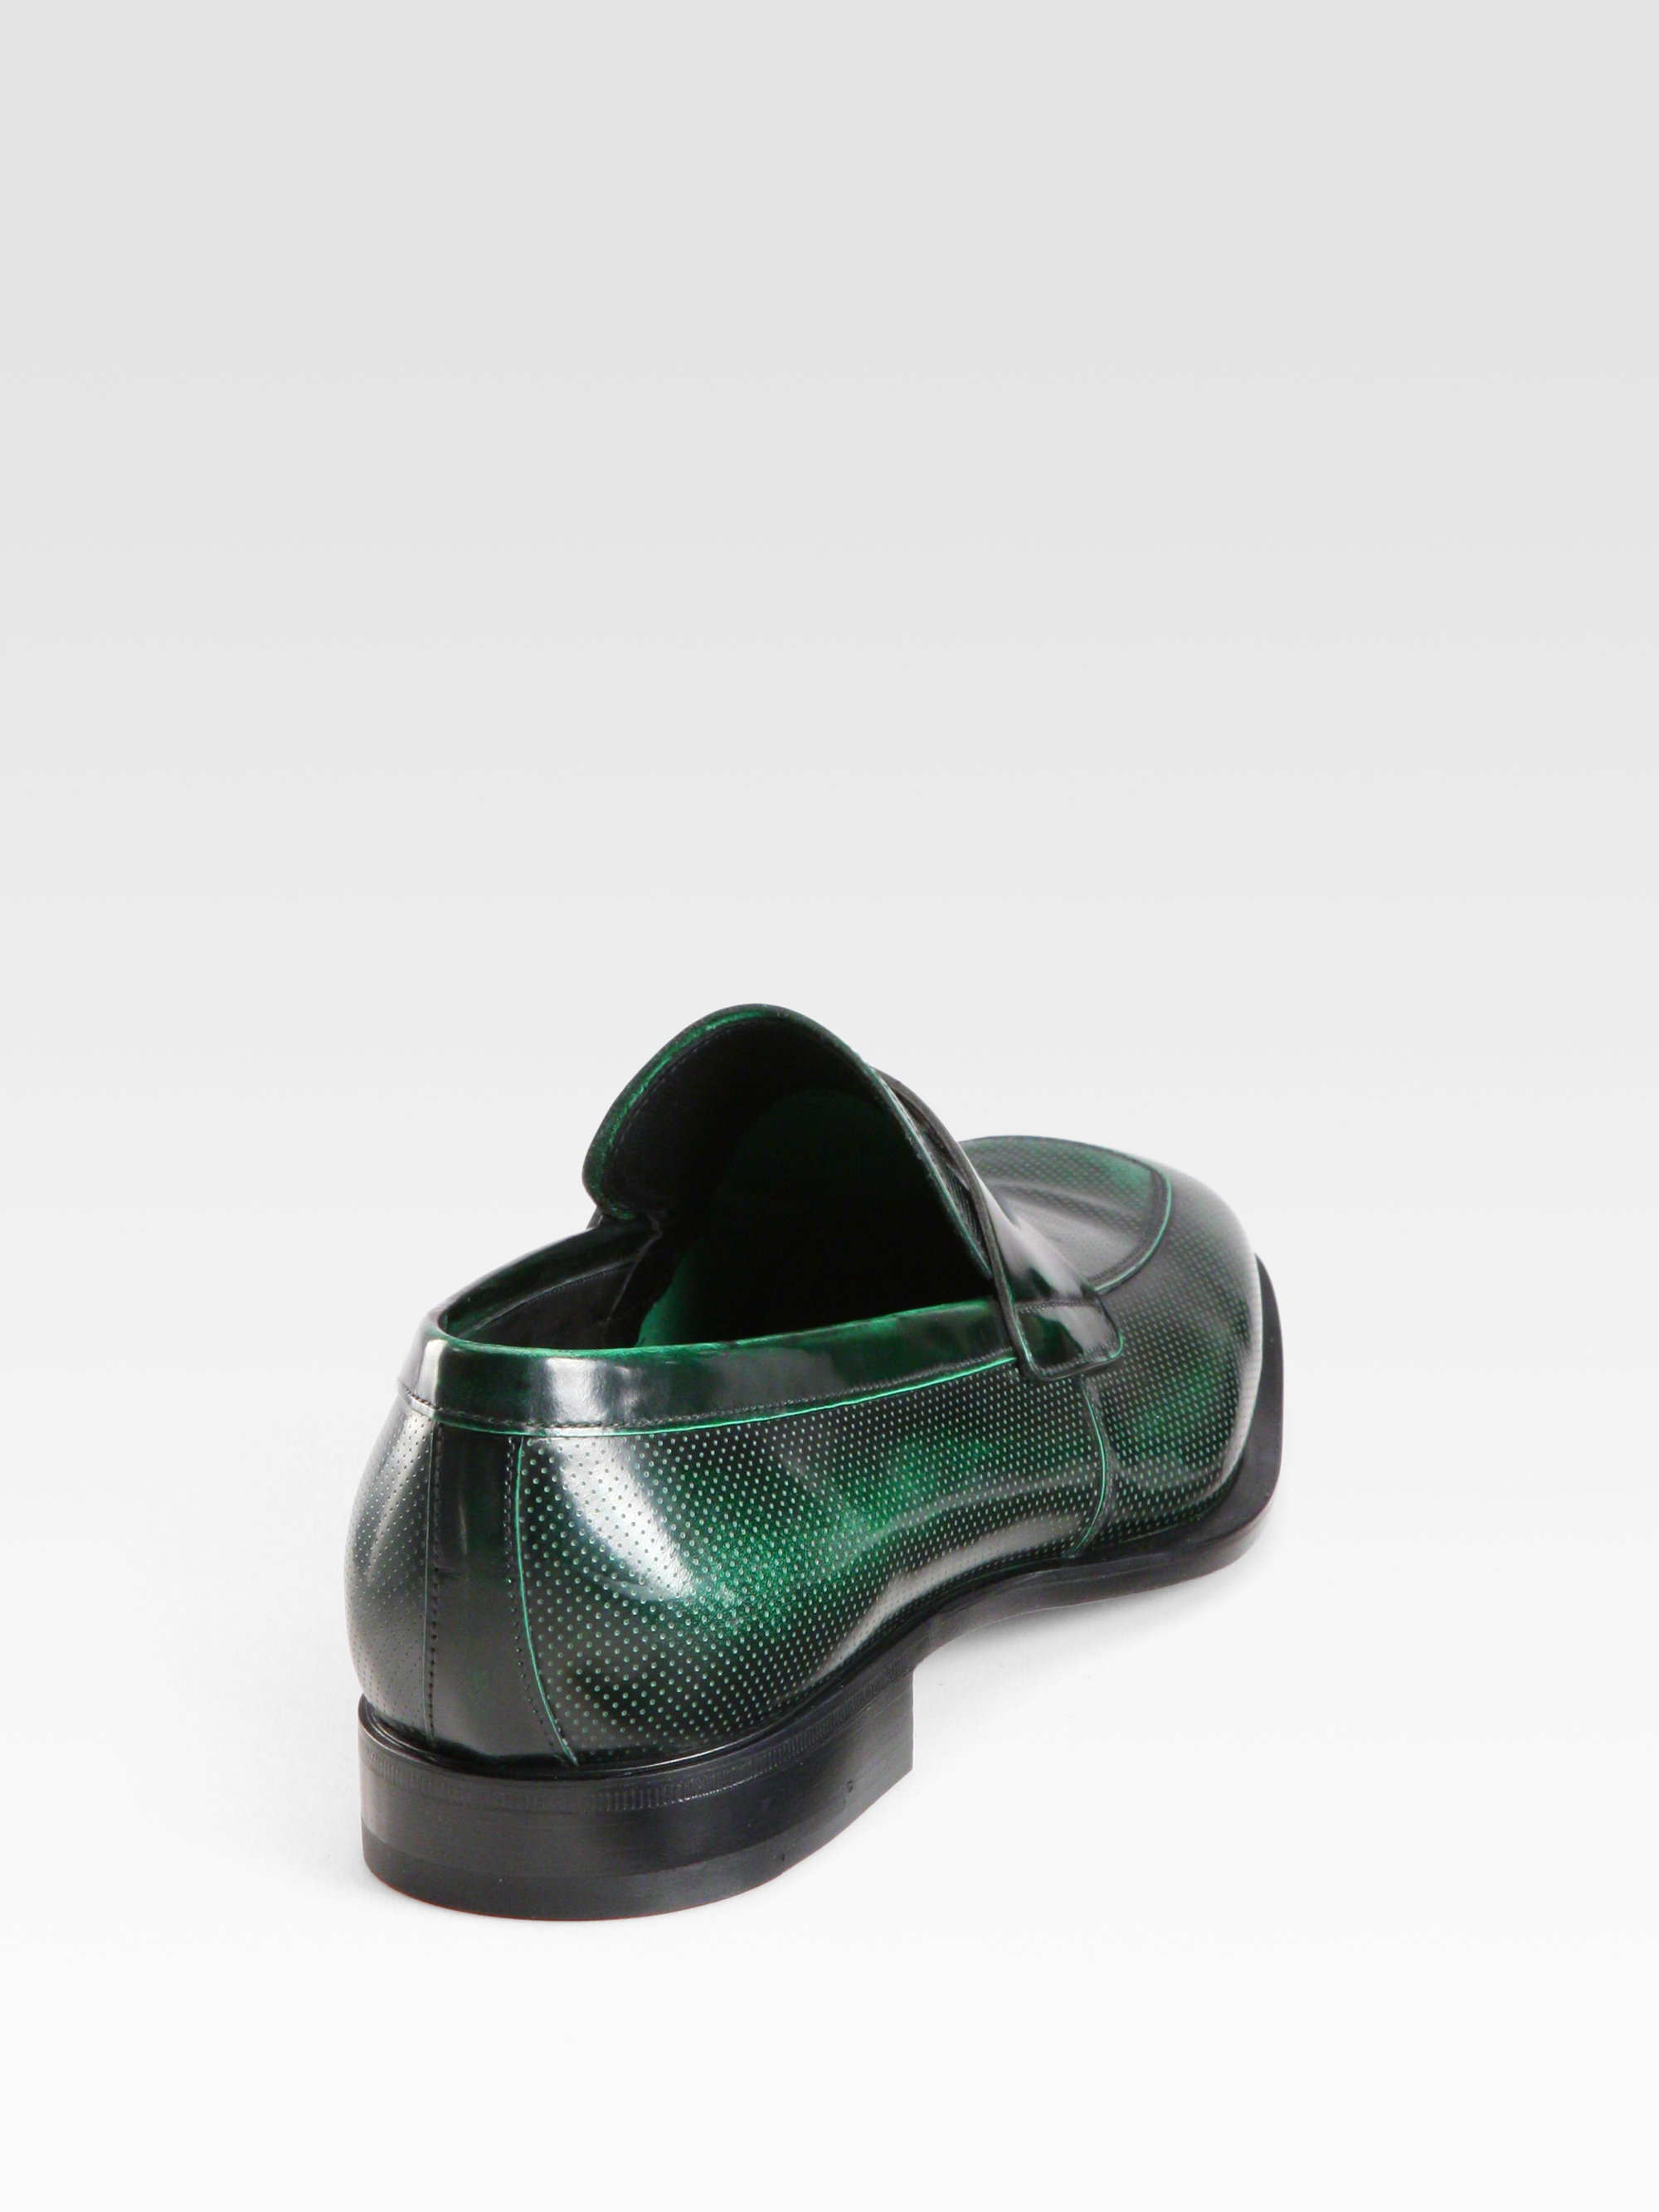 Lyst Prada Spazzolato Penny Loafers In Green For Men